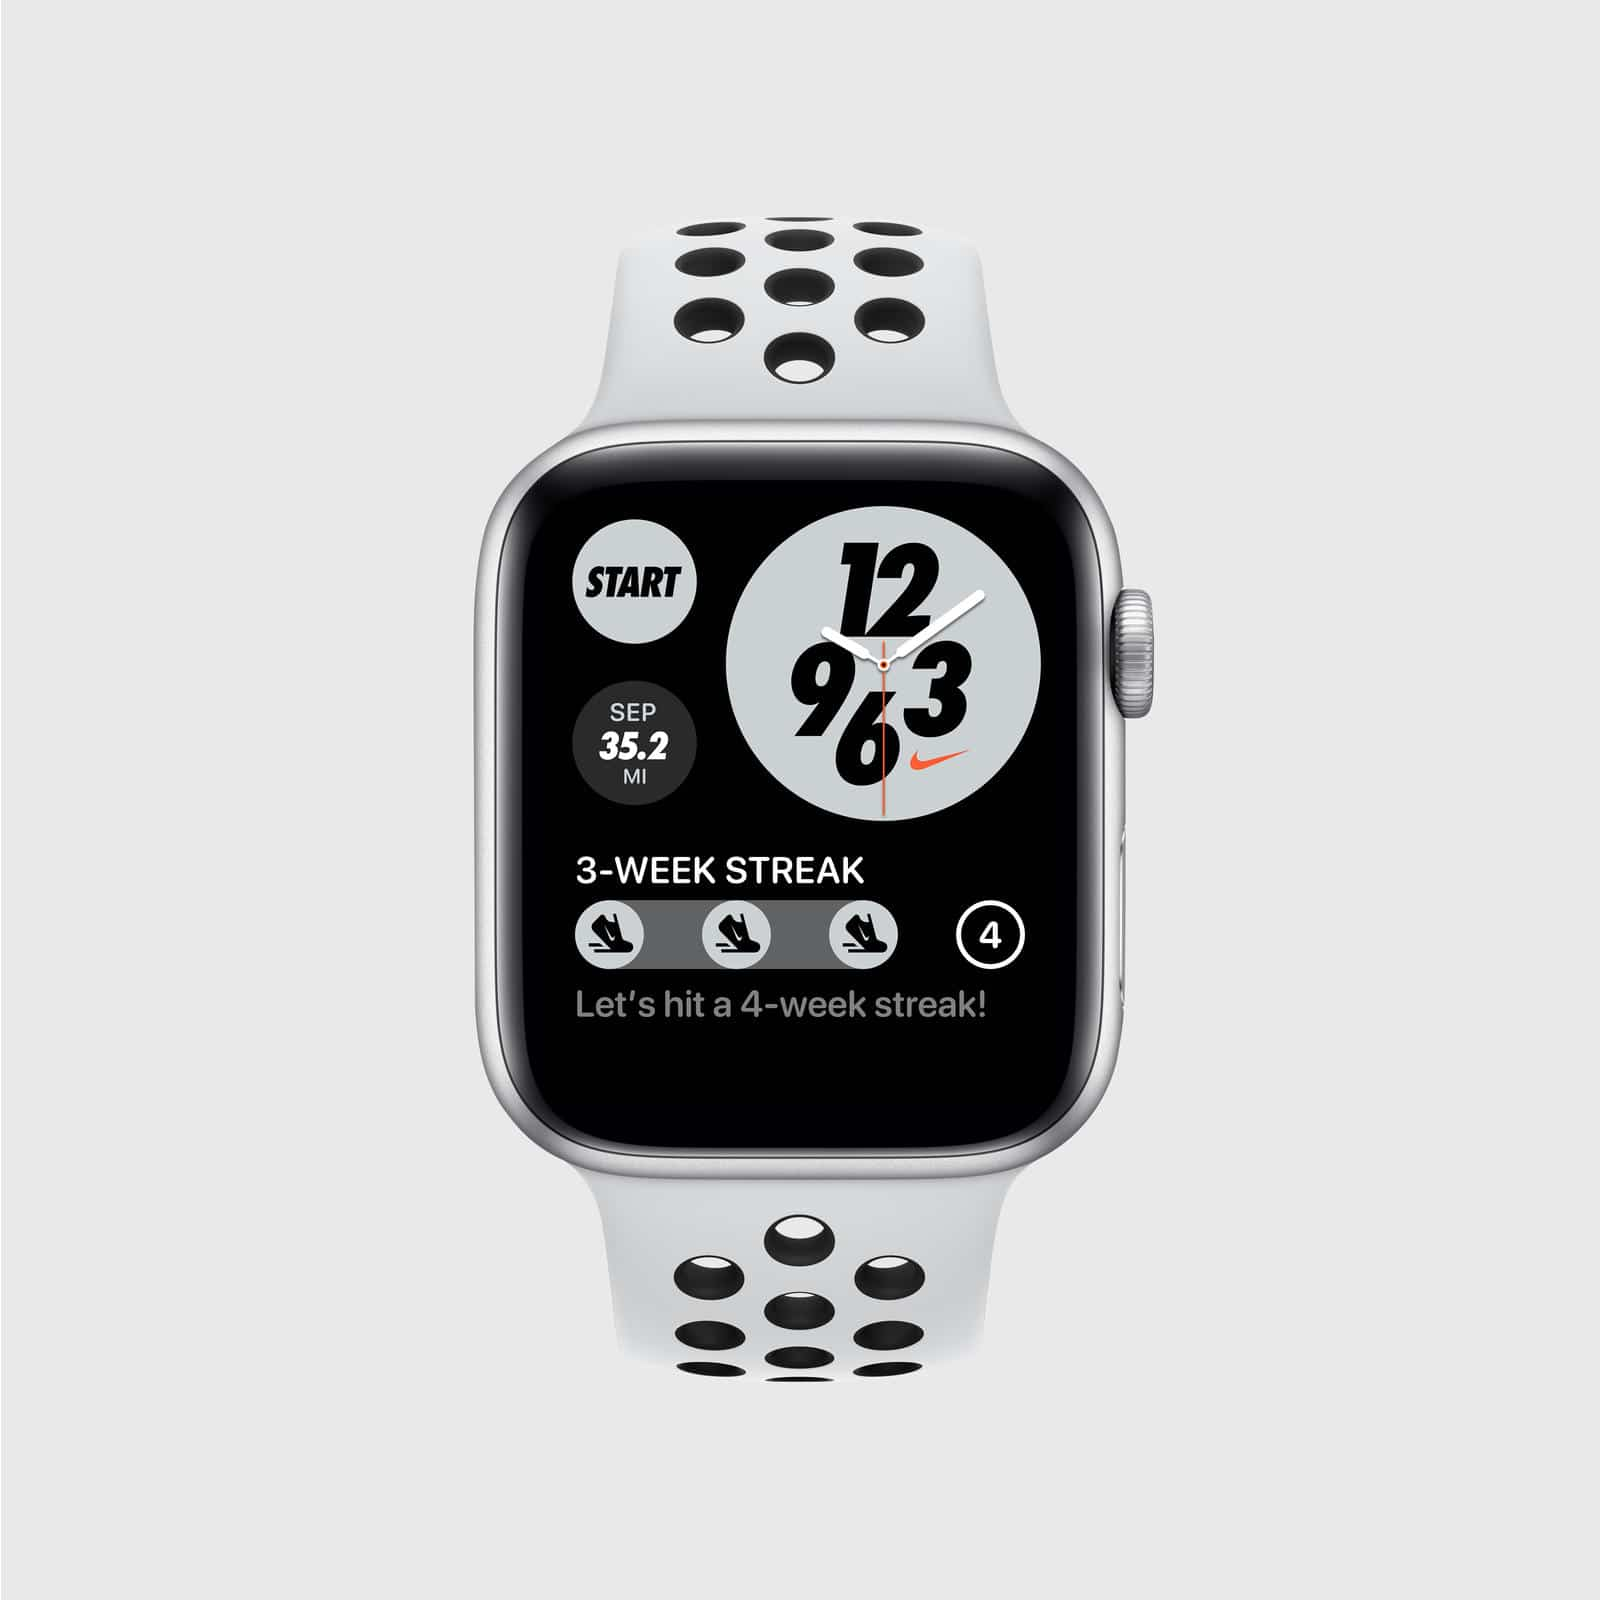 Novos recursos para o Apple Watch Nike